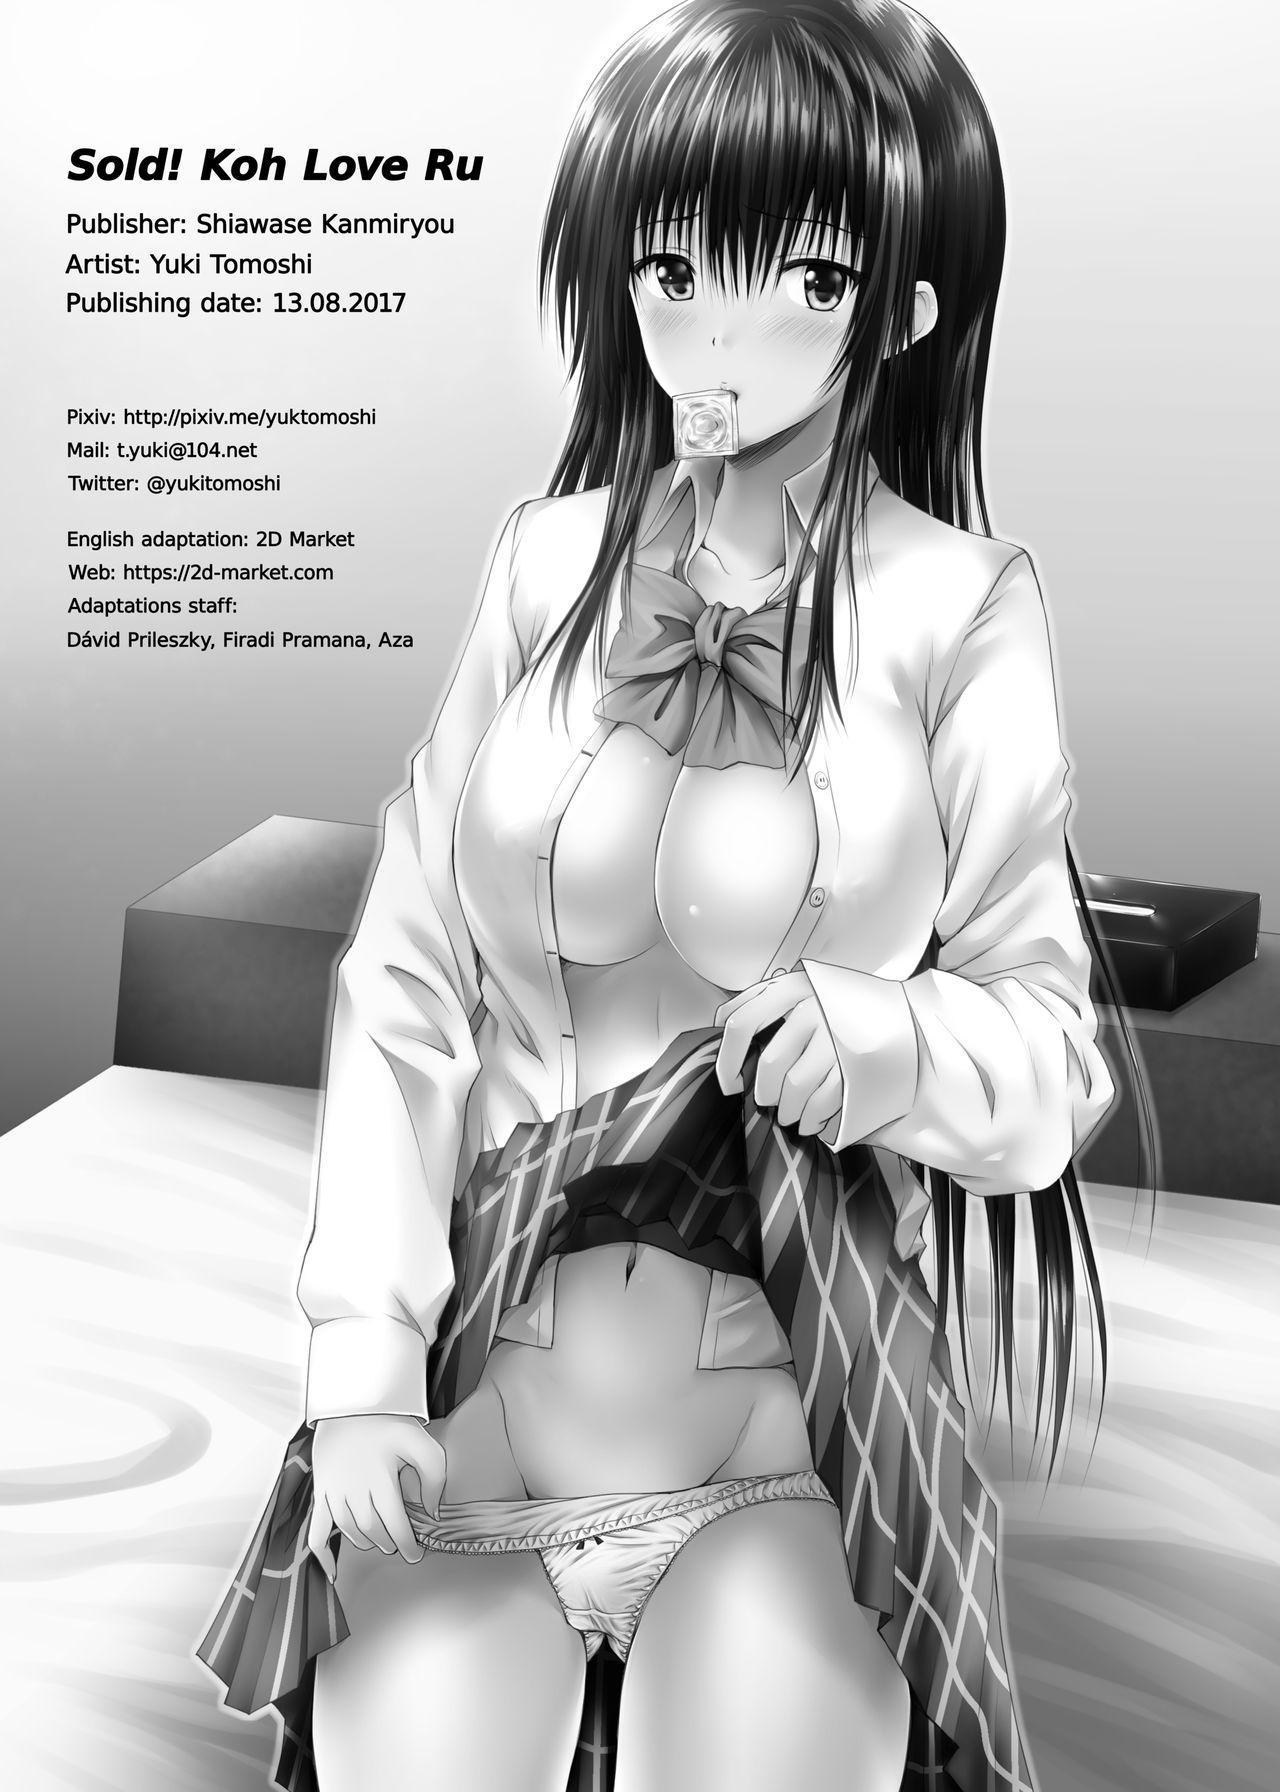 [Shiawase Kanmiryou (Yuki Tomoshi)] En! Koh LOVE-Ru | Sold! Koh LOVE-Ru (To LOVE-Ru) [English] {2d-market.com} [Decensored] [Digital] 16